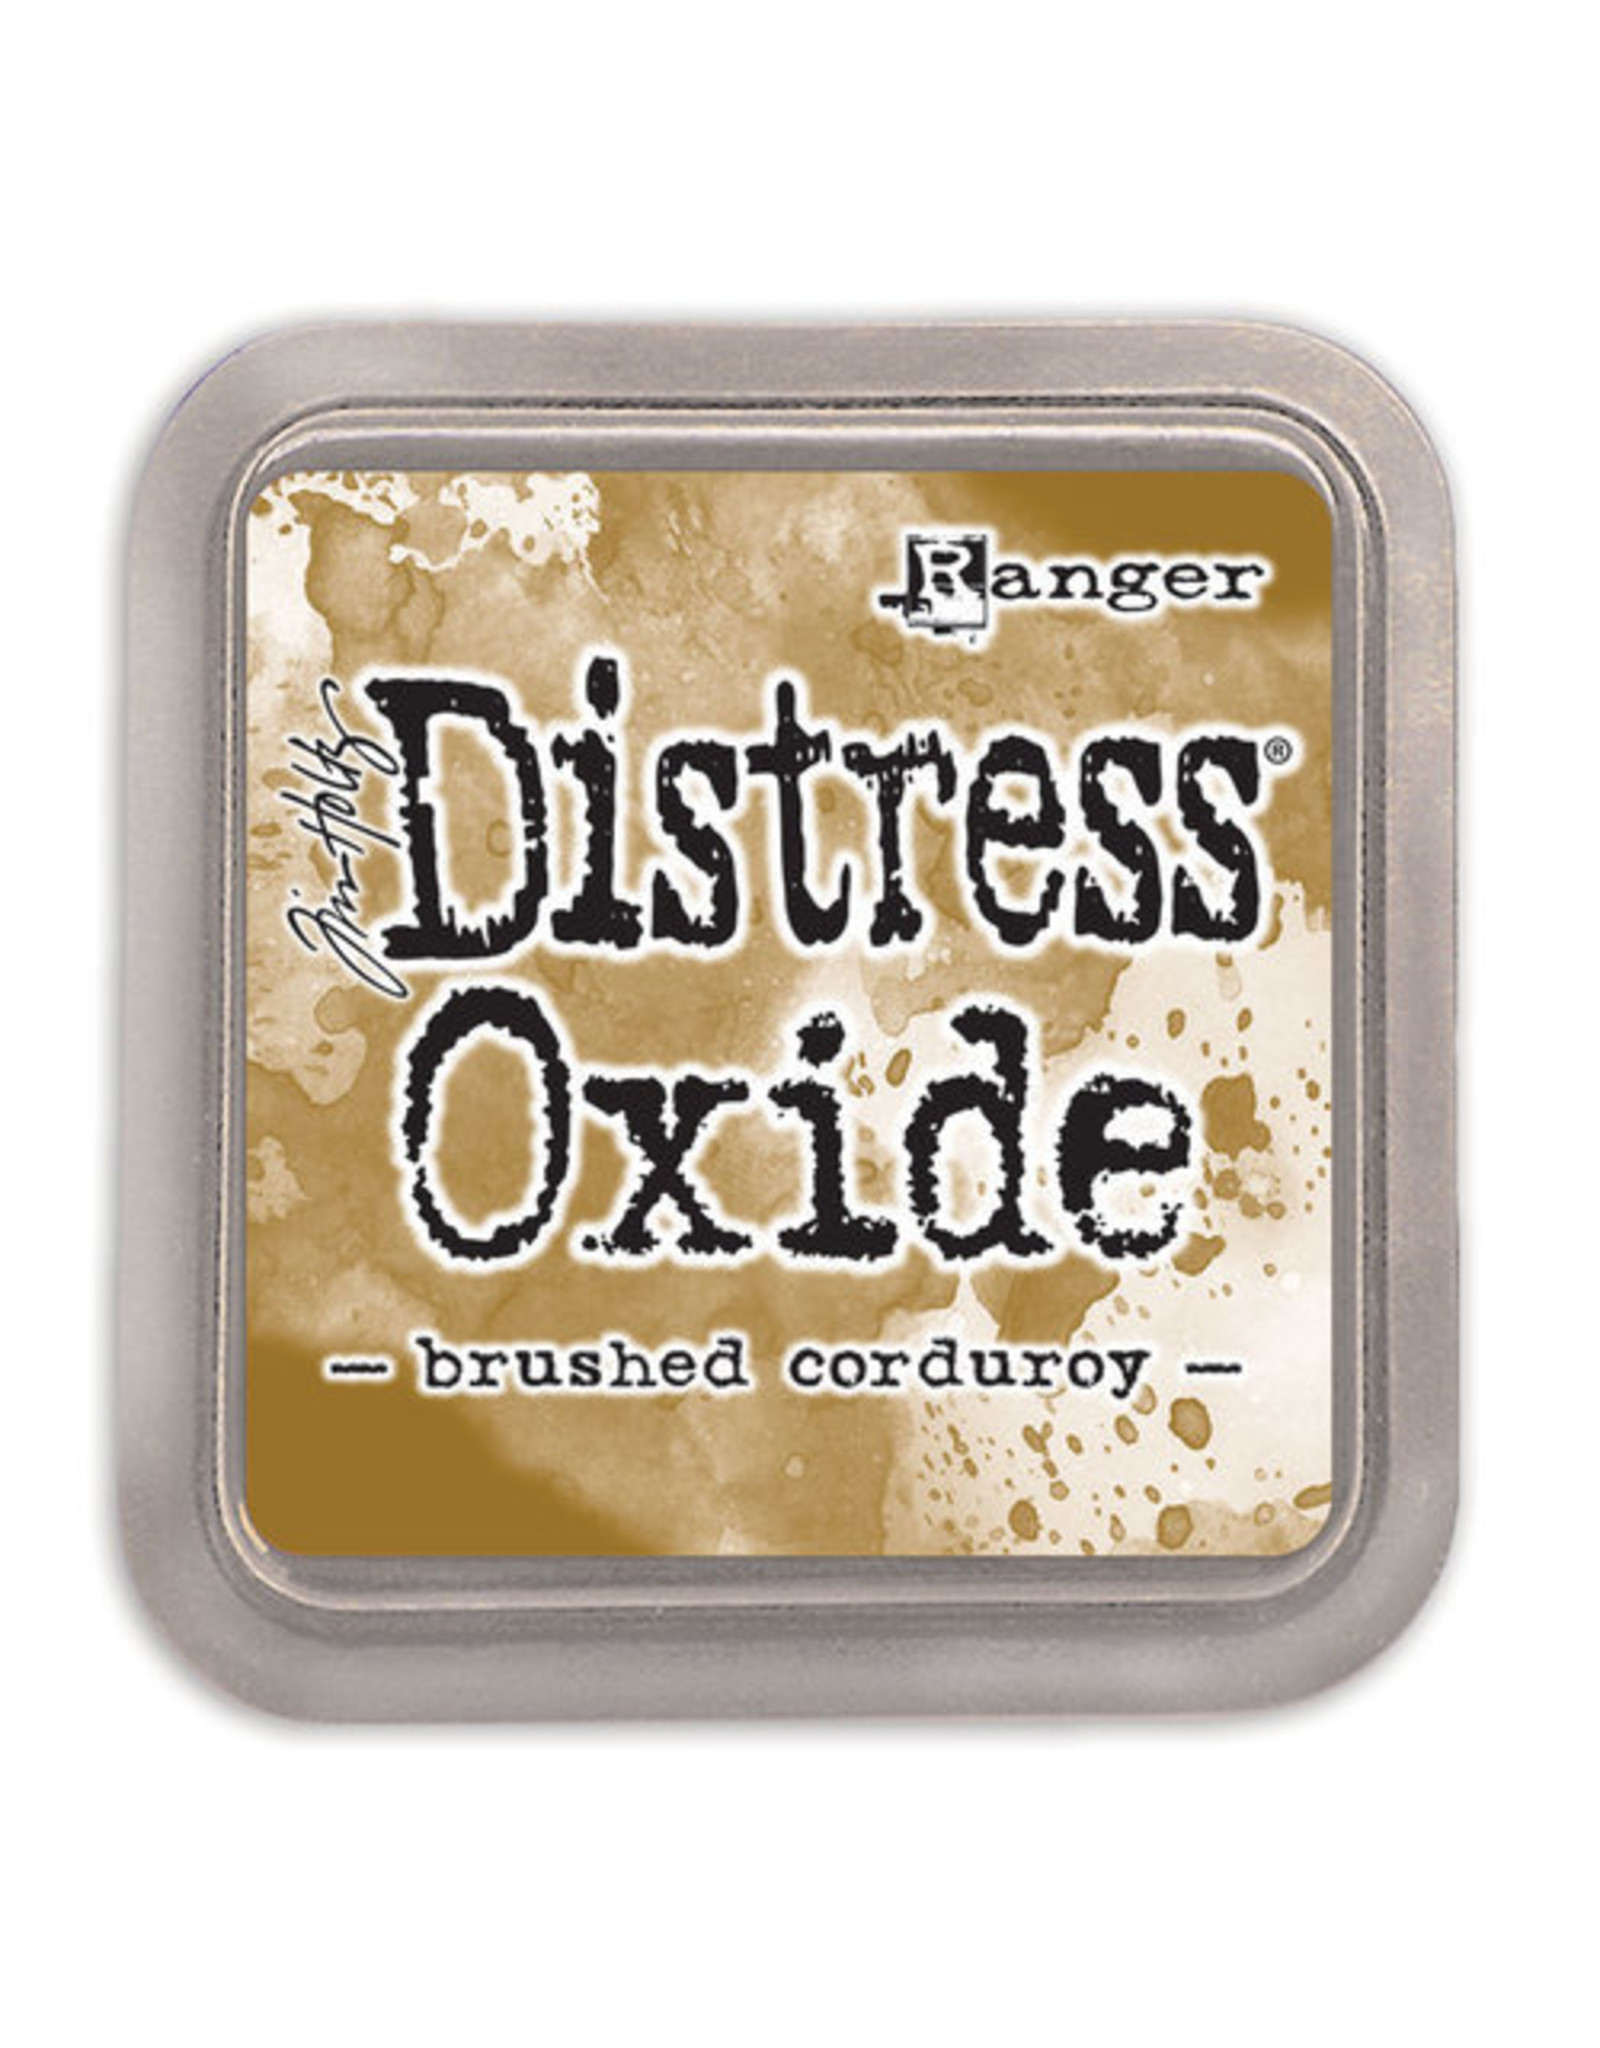 Ranger Distress Oxide Ink Pad - Brushed Corduroy